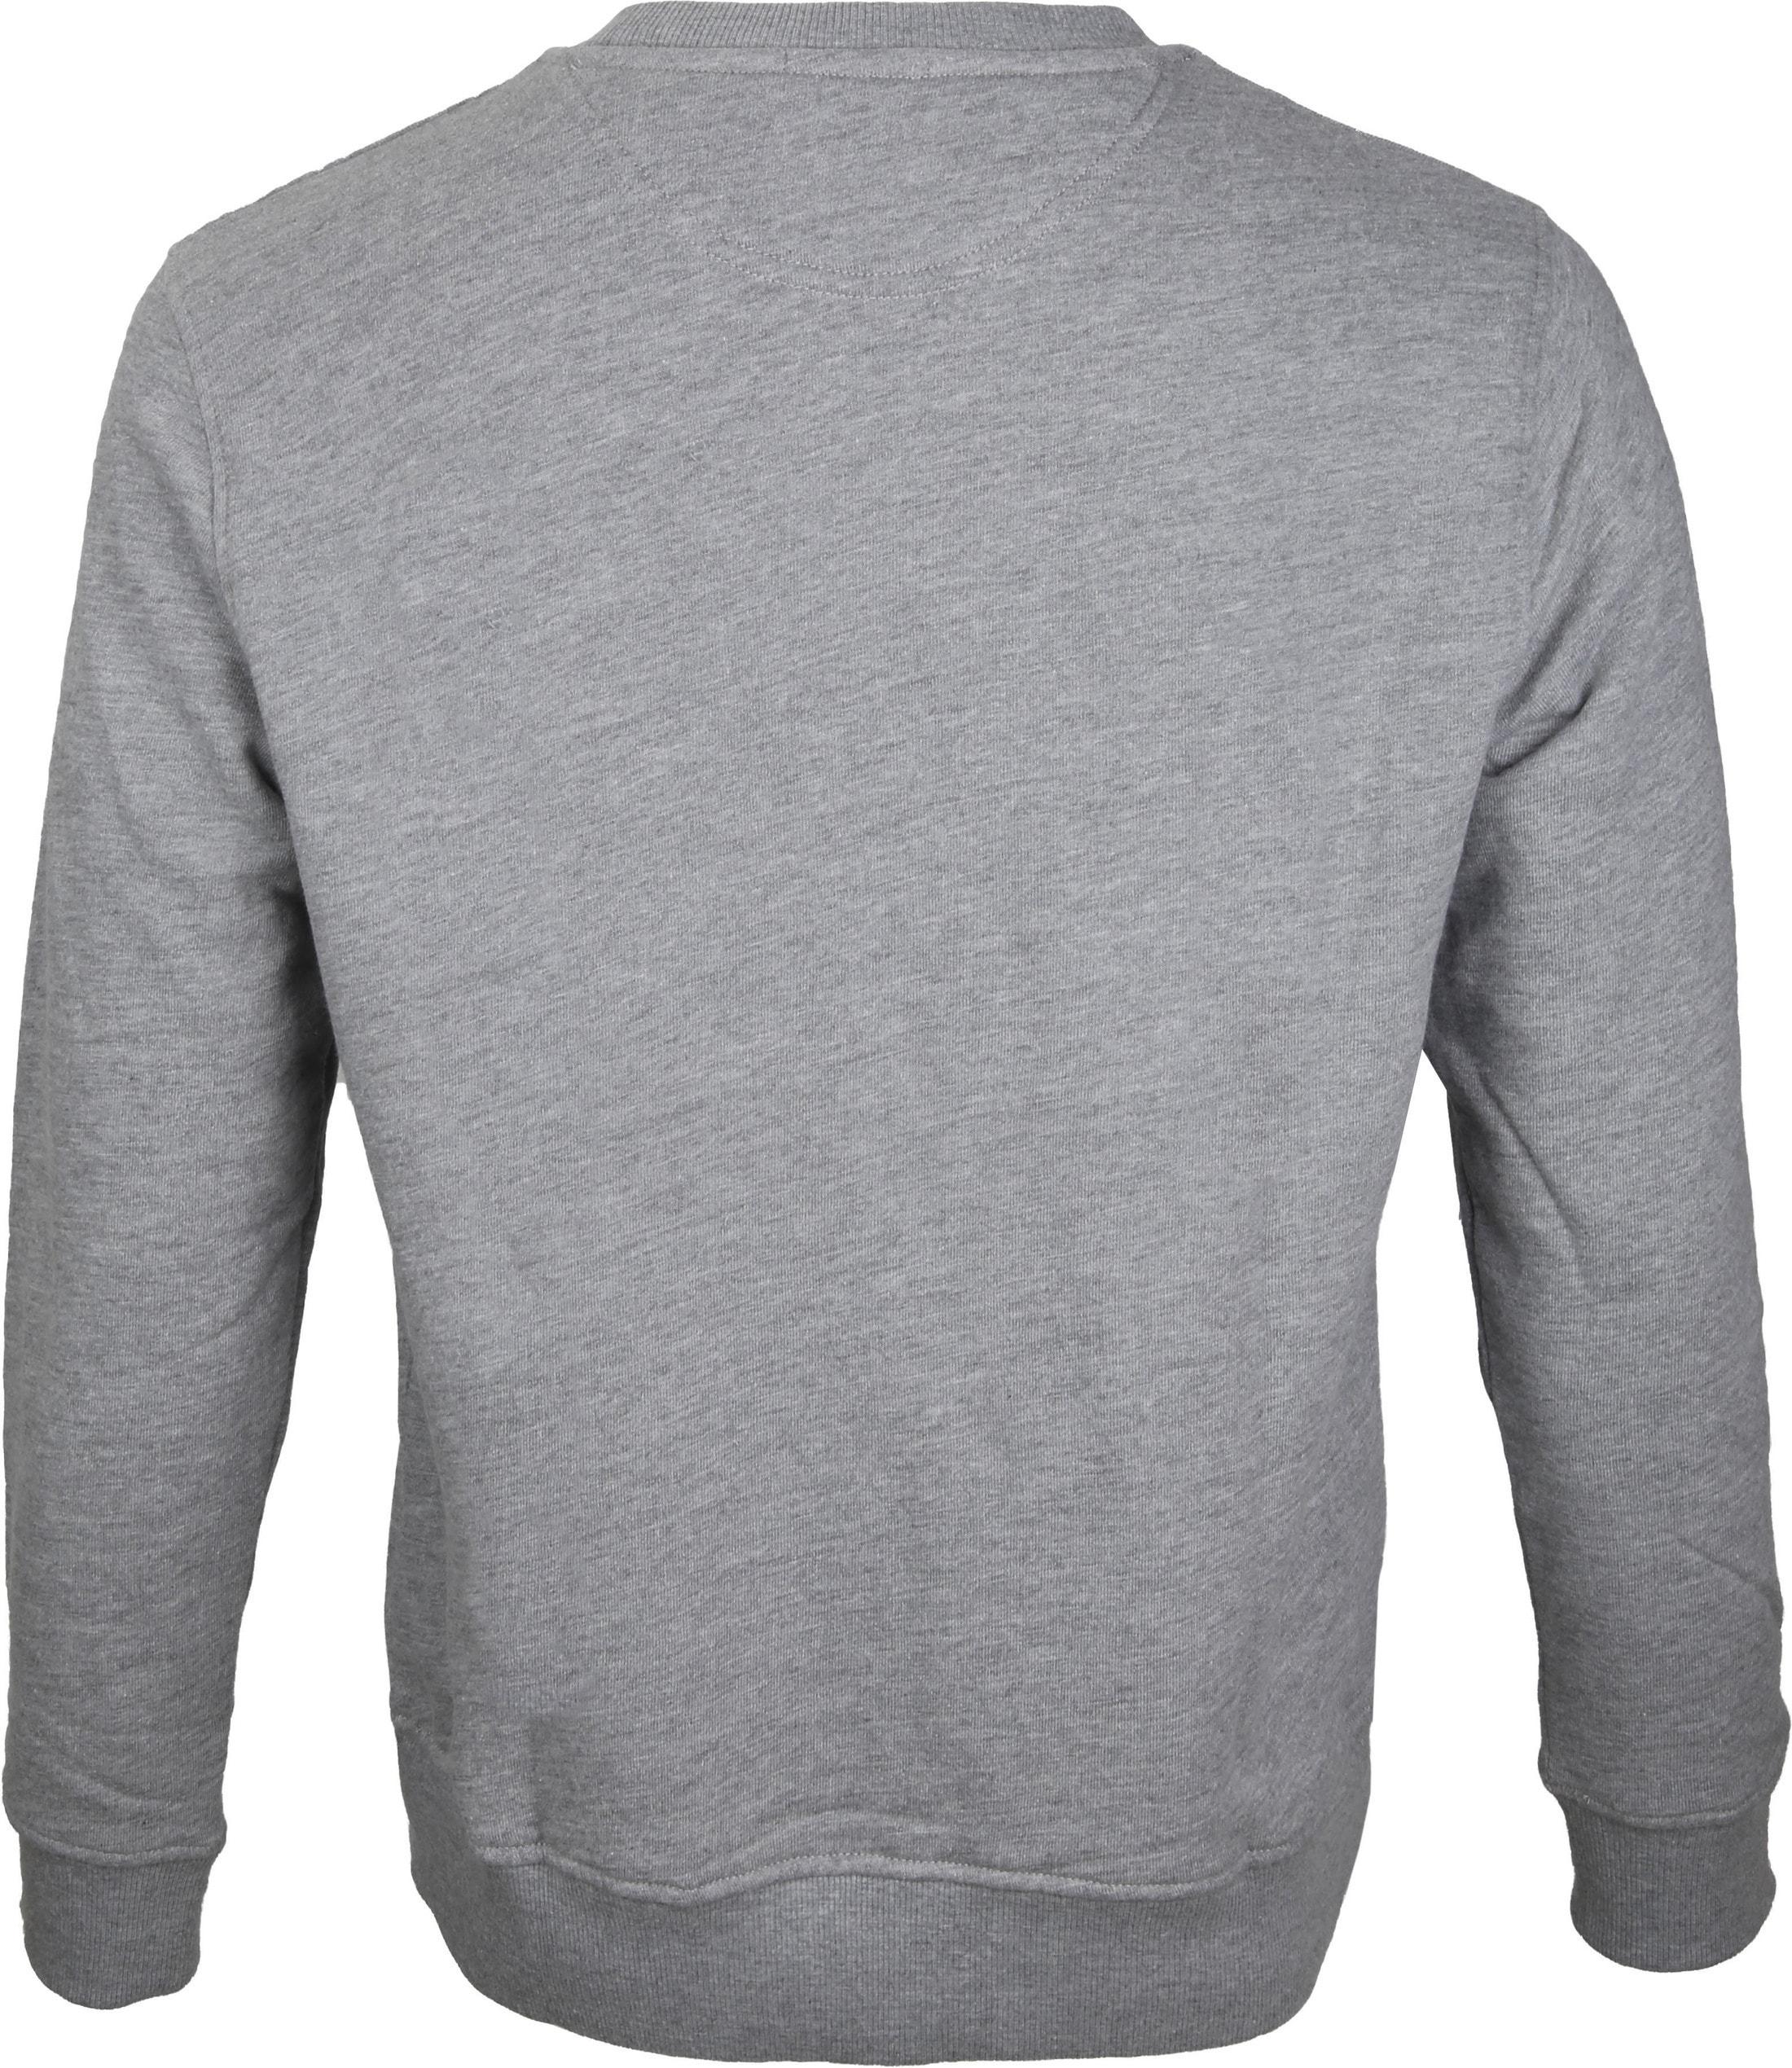 Timberland Sweater Grijs Logo foto 2